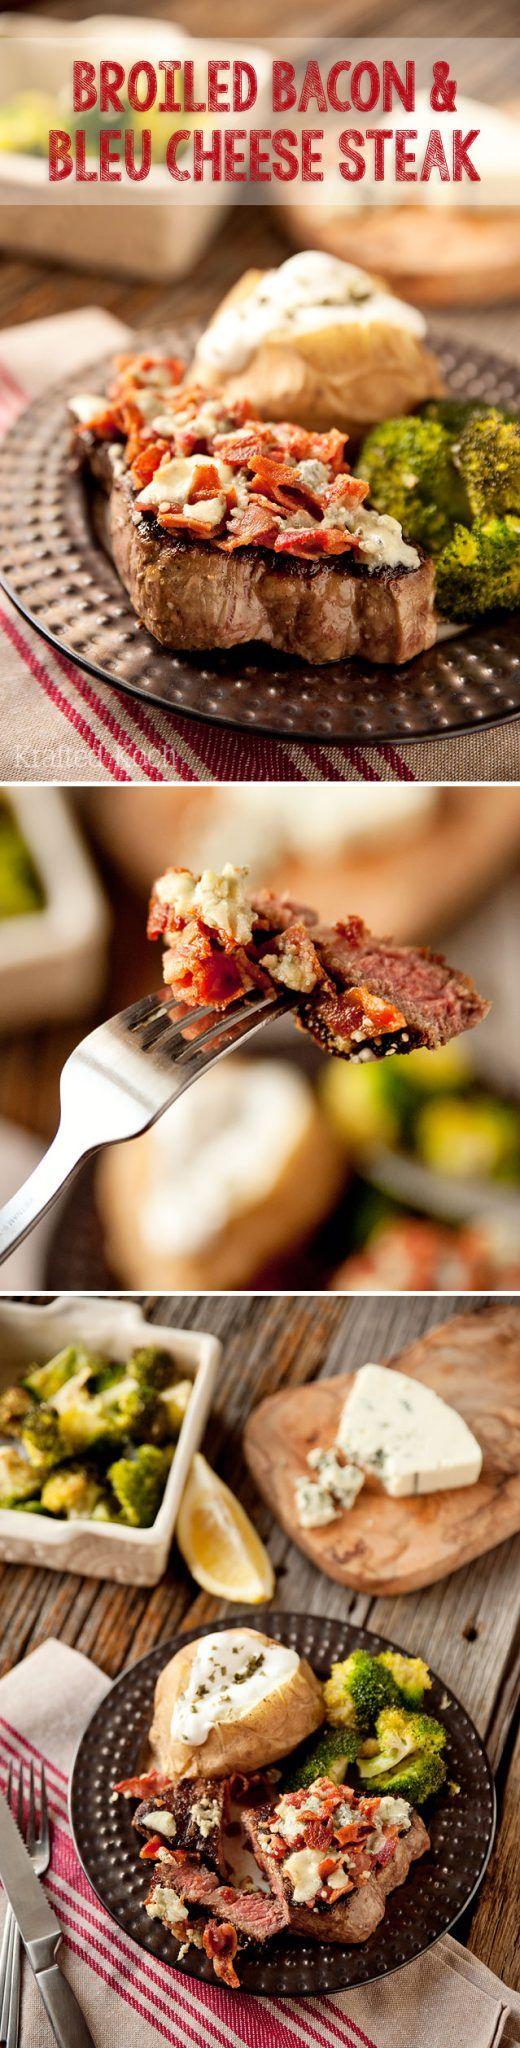 Broiled Bacon & Bleu Cheese Steak